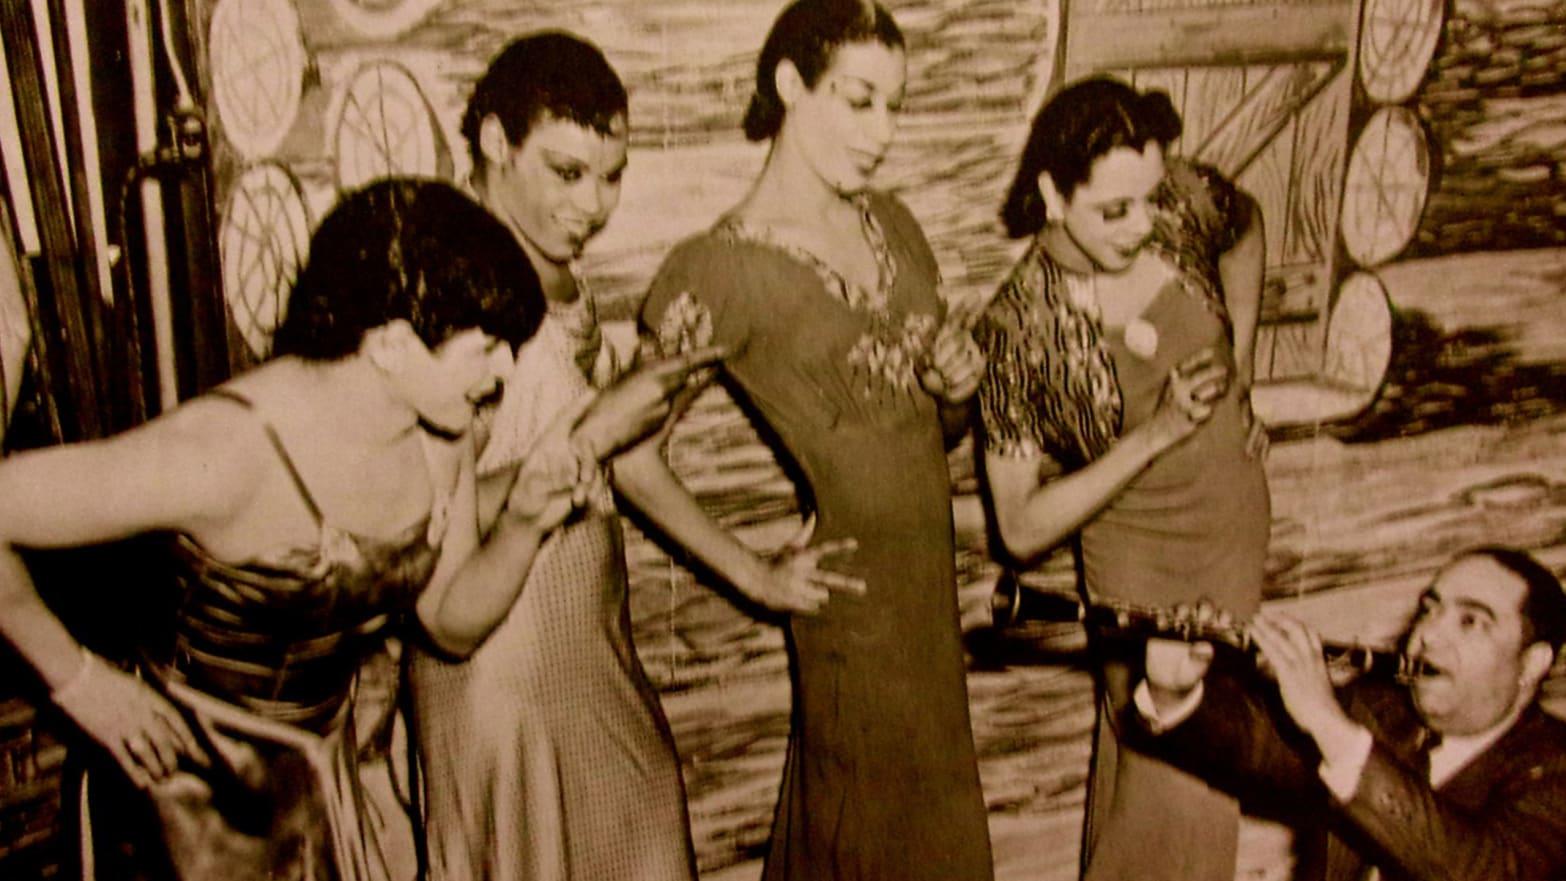 Get a Glimpse of Chicago's Wild Forgotten 'Roaring Twenties' Gay Scene